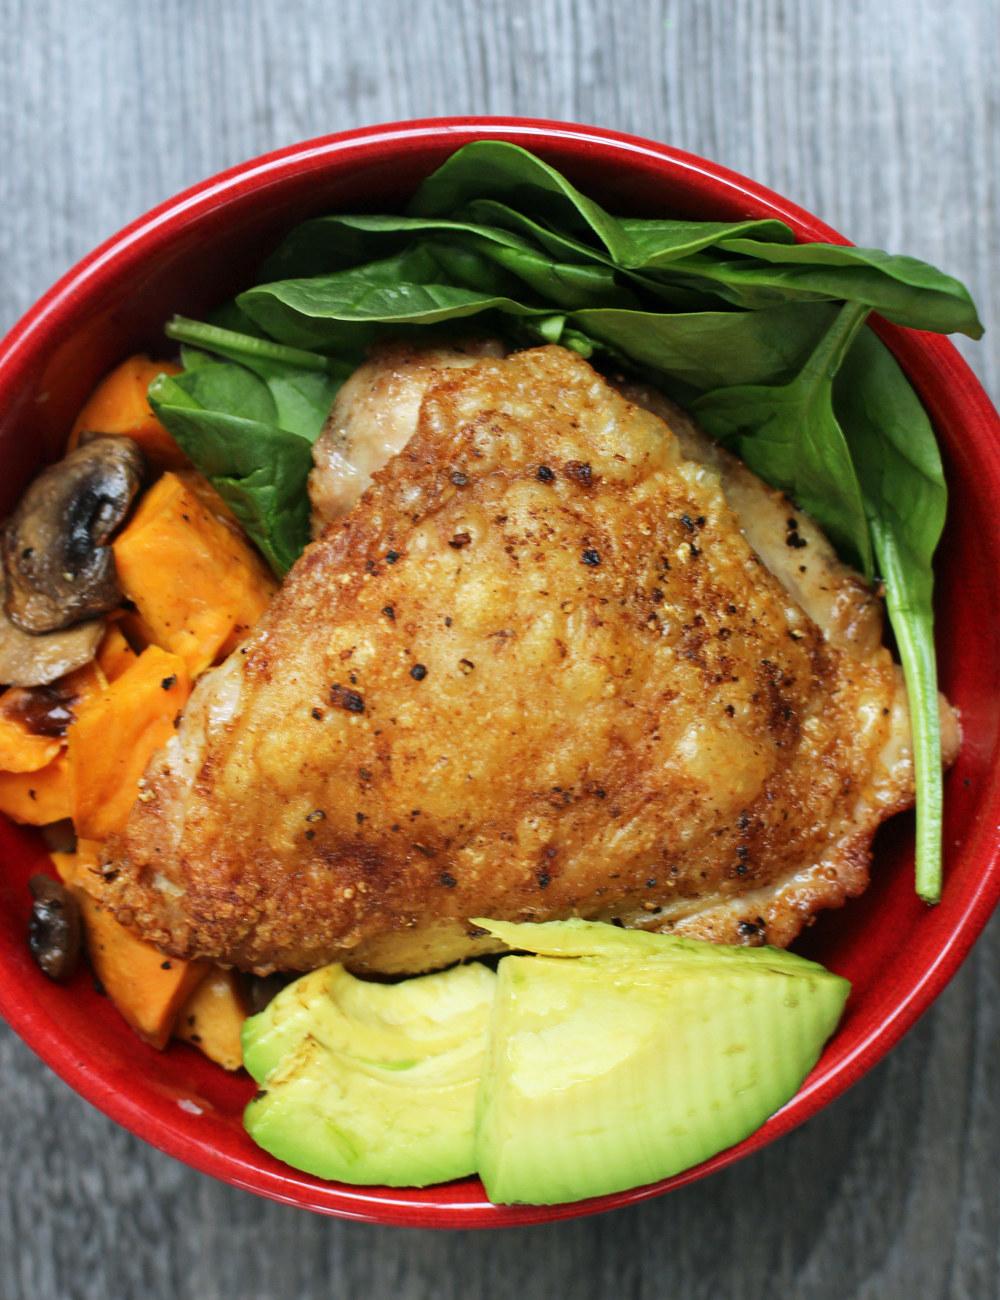 Here S A 40 Weeklong Meal Plan You Can Actually Follow